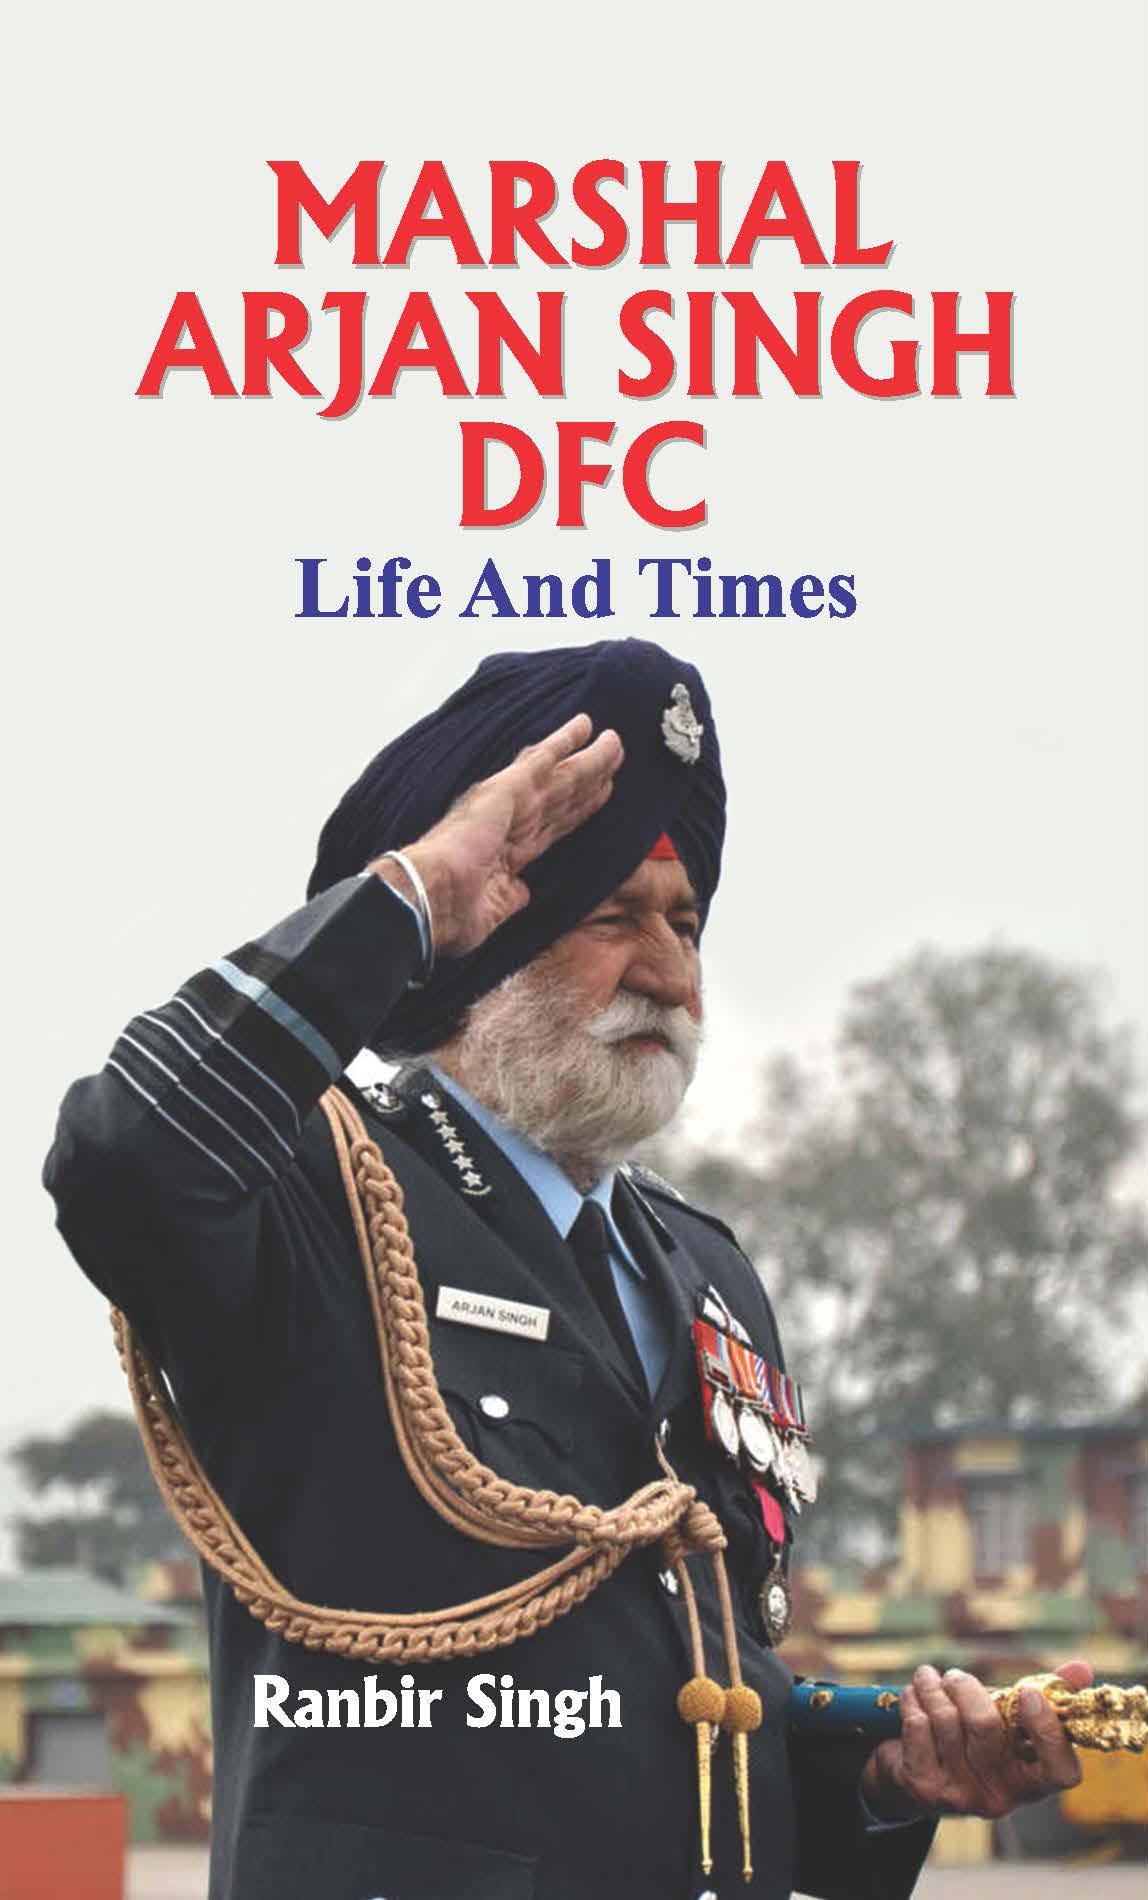 Marshal Arjan Singh DFC: Life and Times (Hardback)